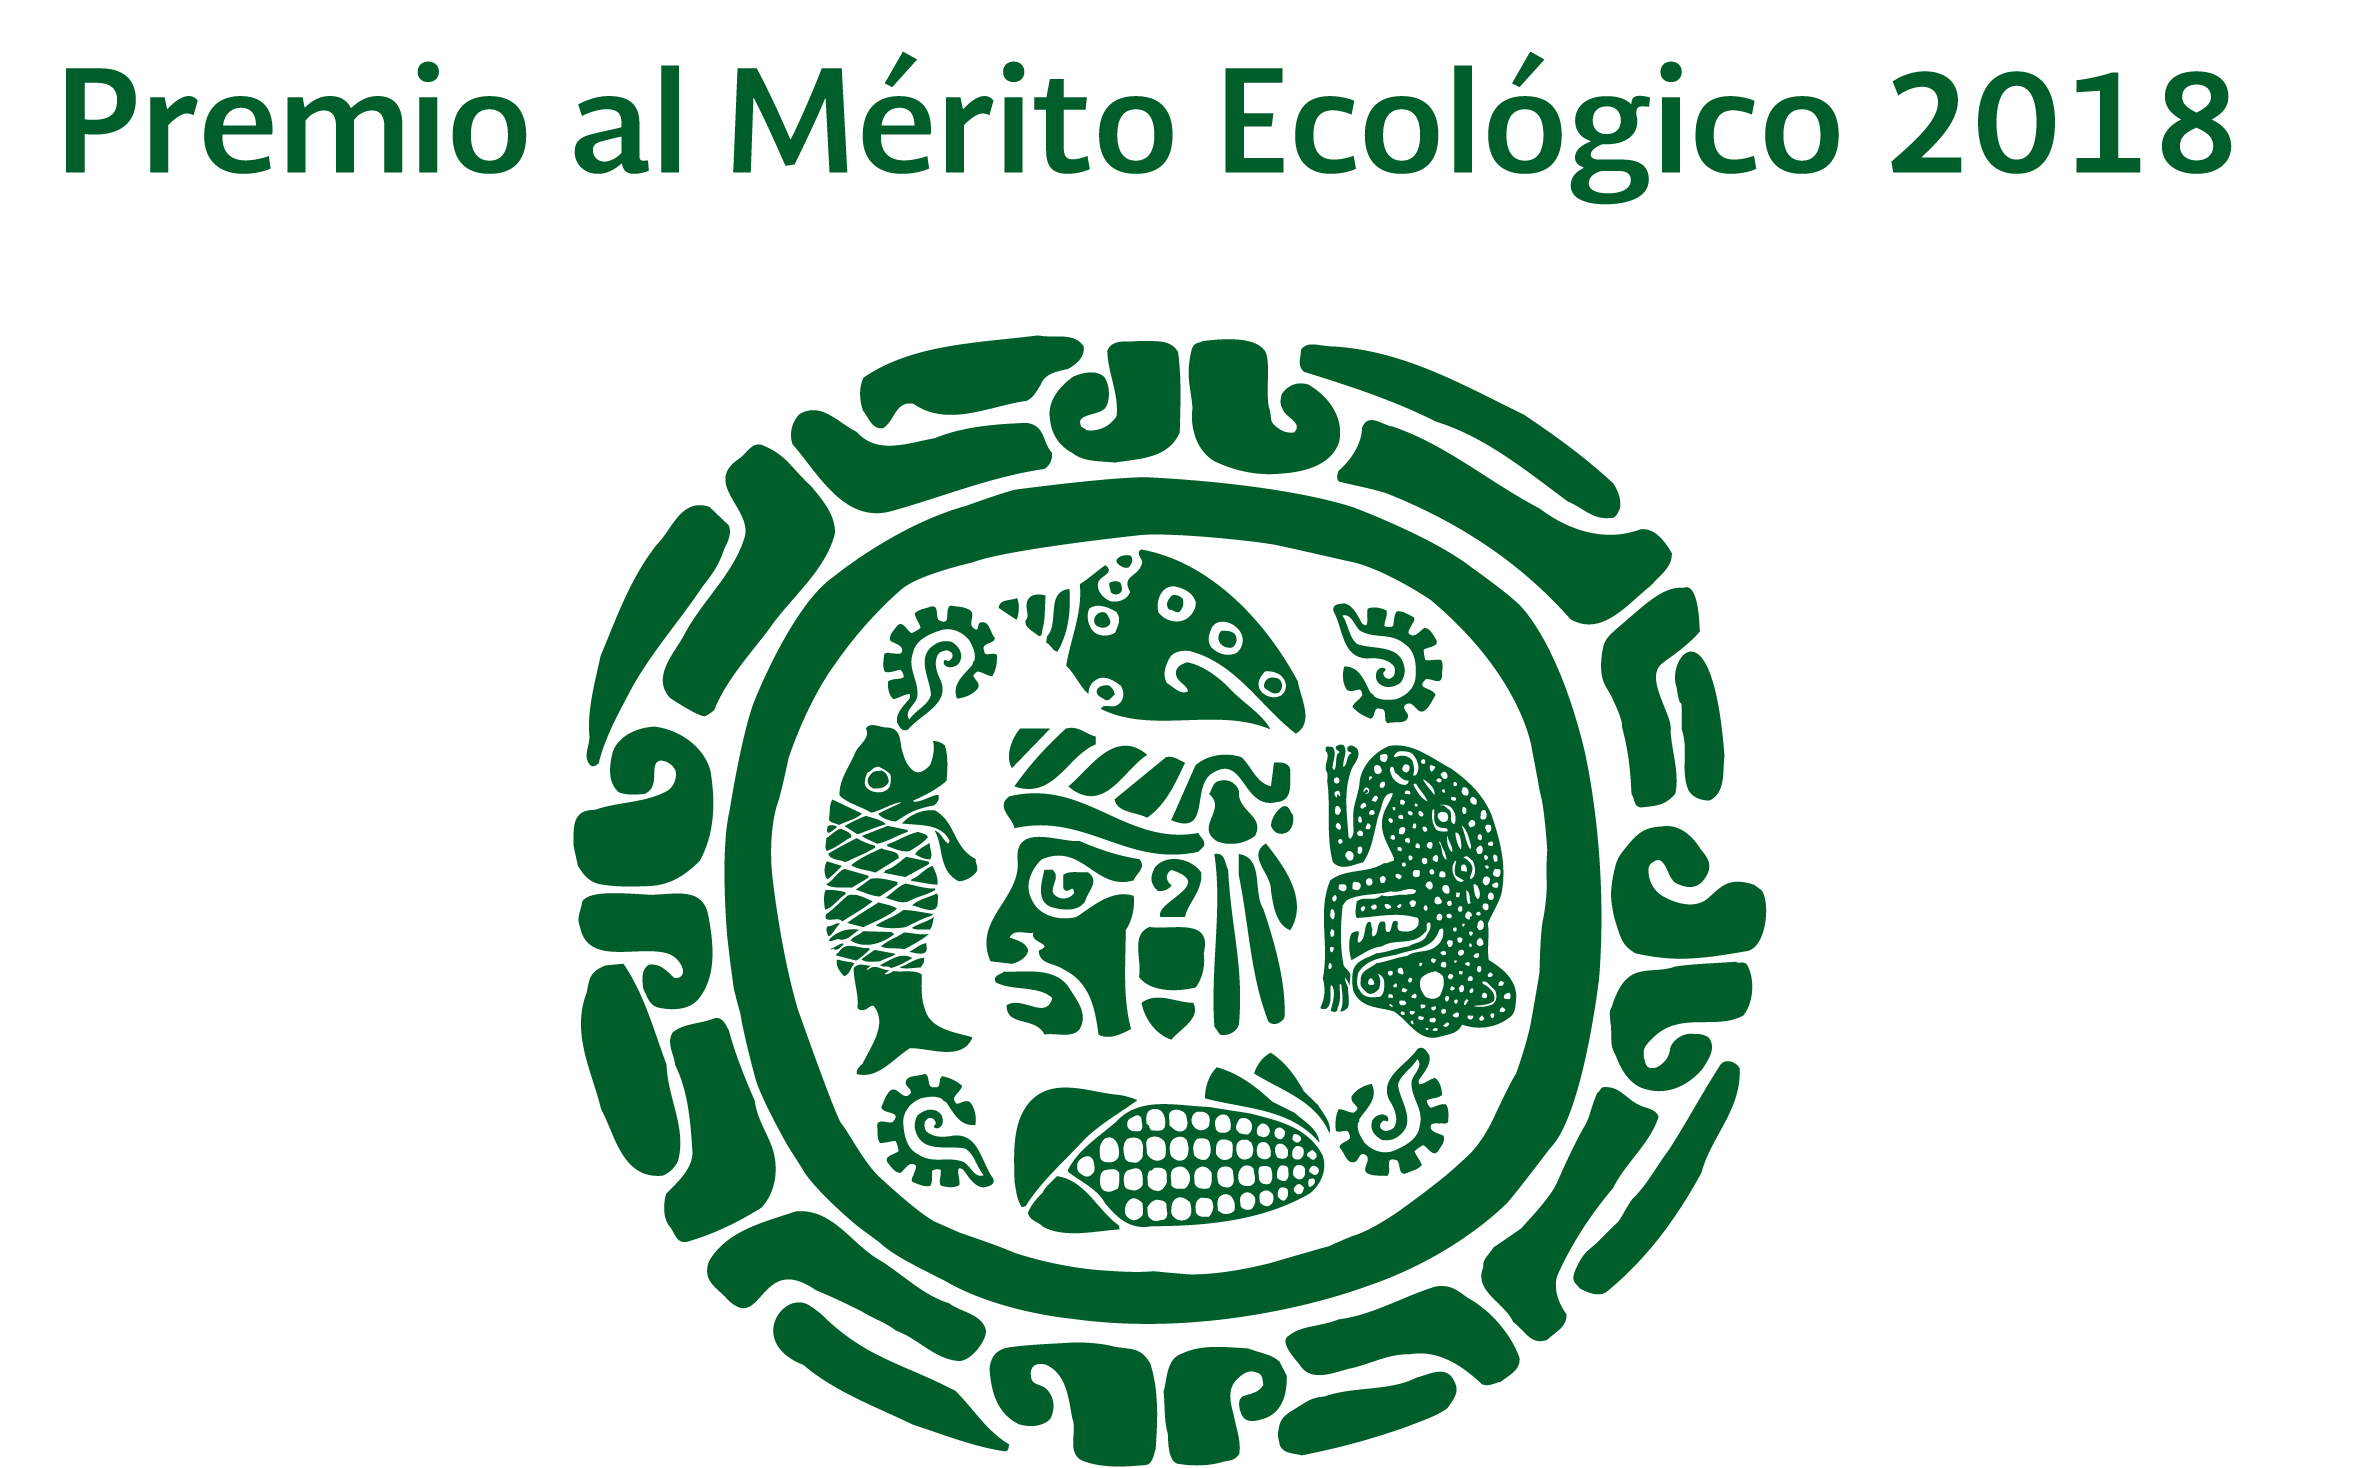 Convocatoria al Premio al Mérito Ecológico 2018